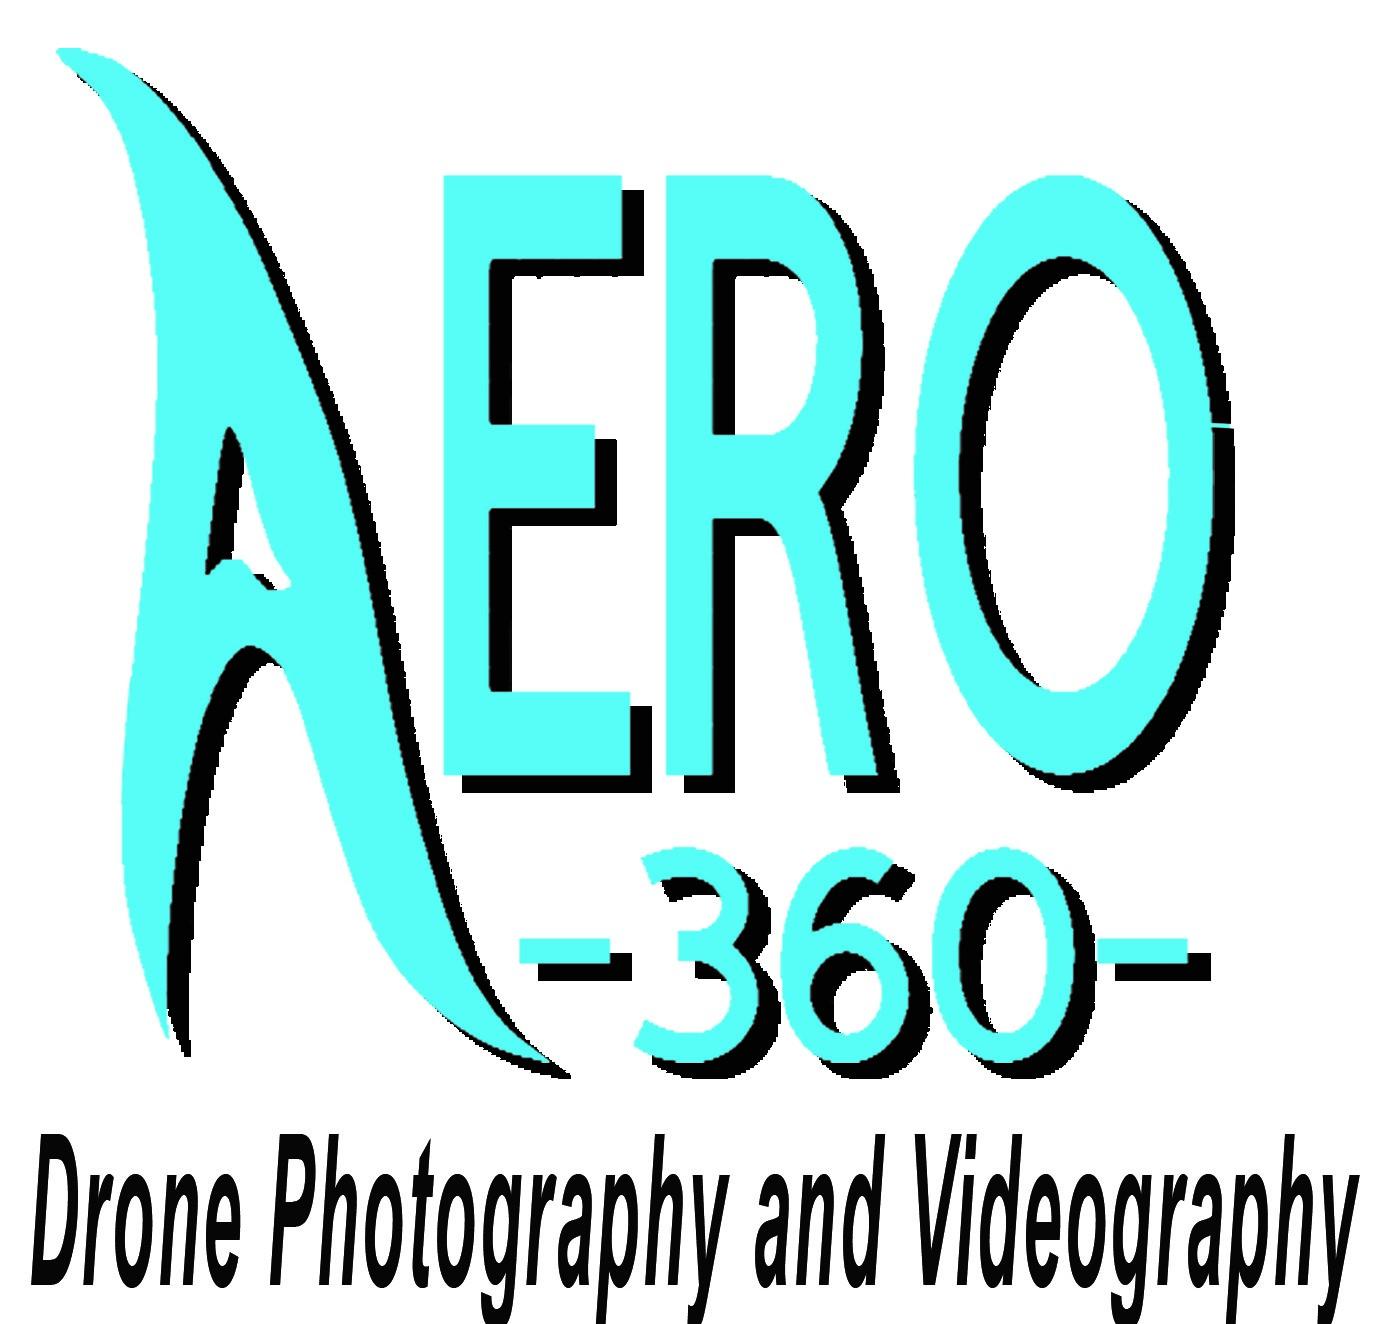 Aero 360